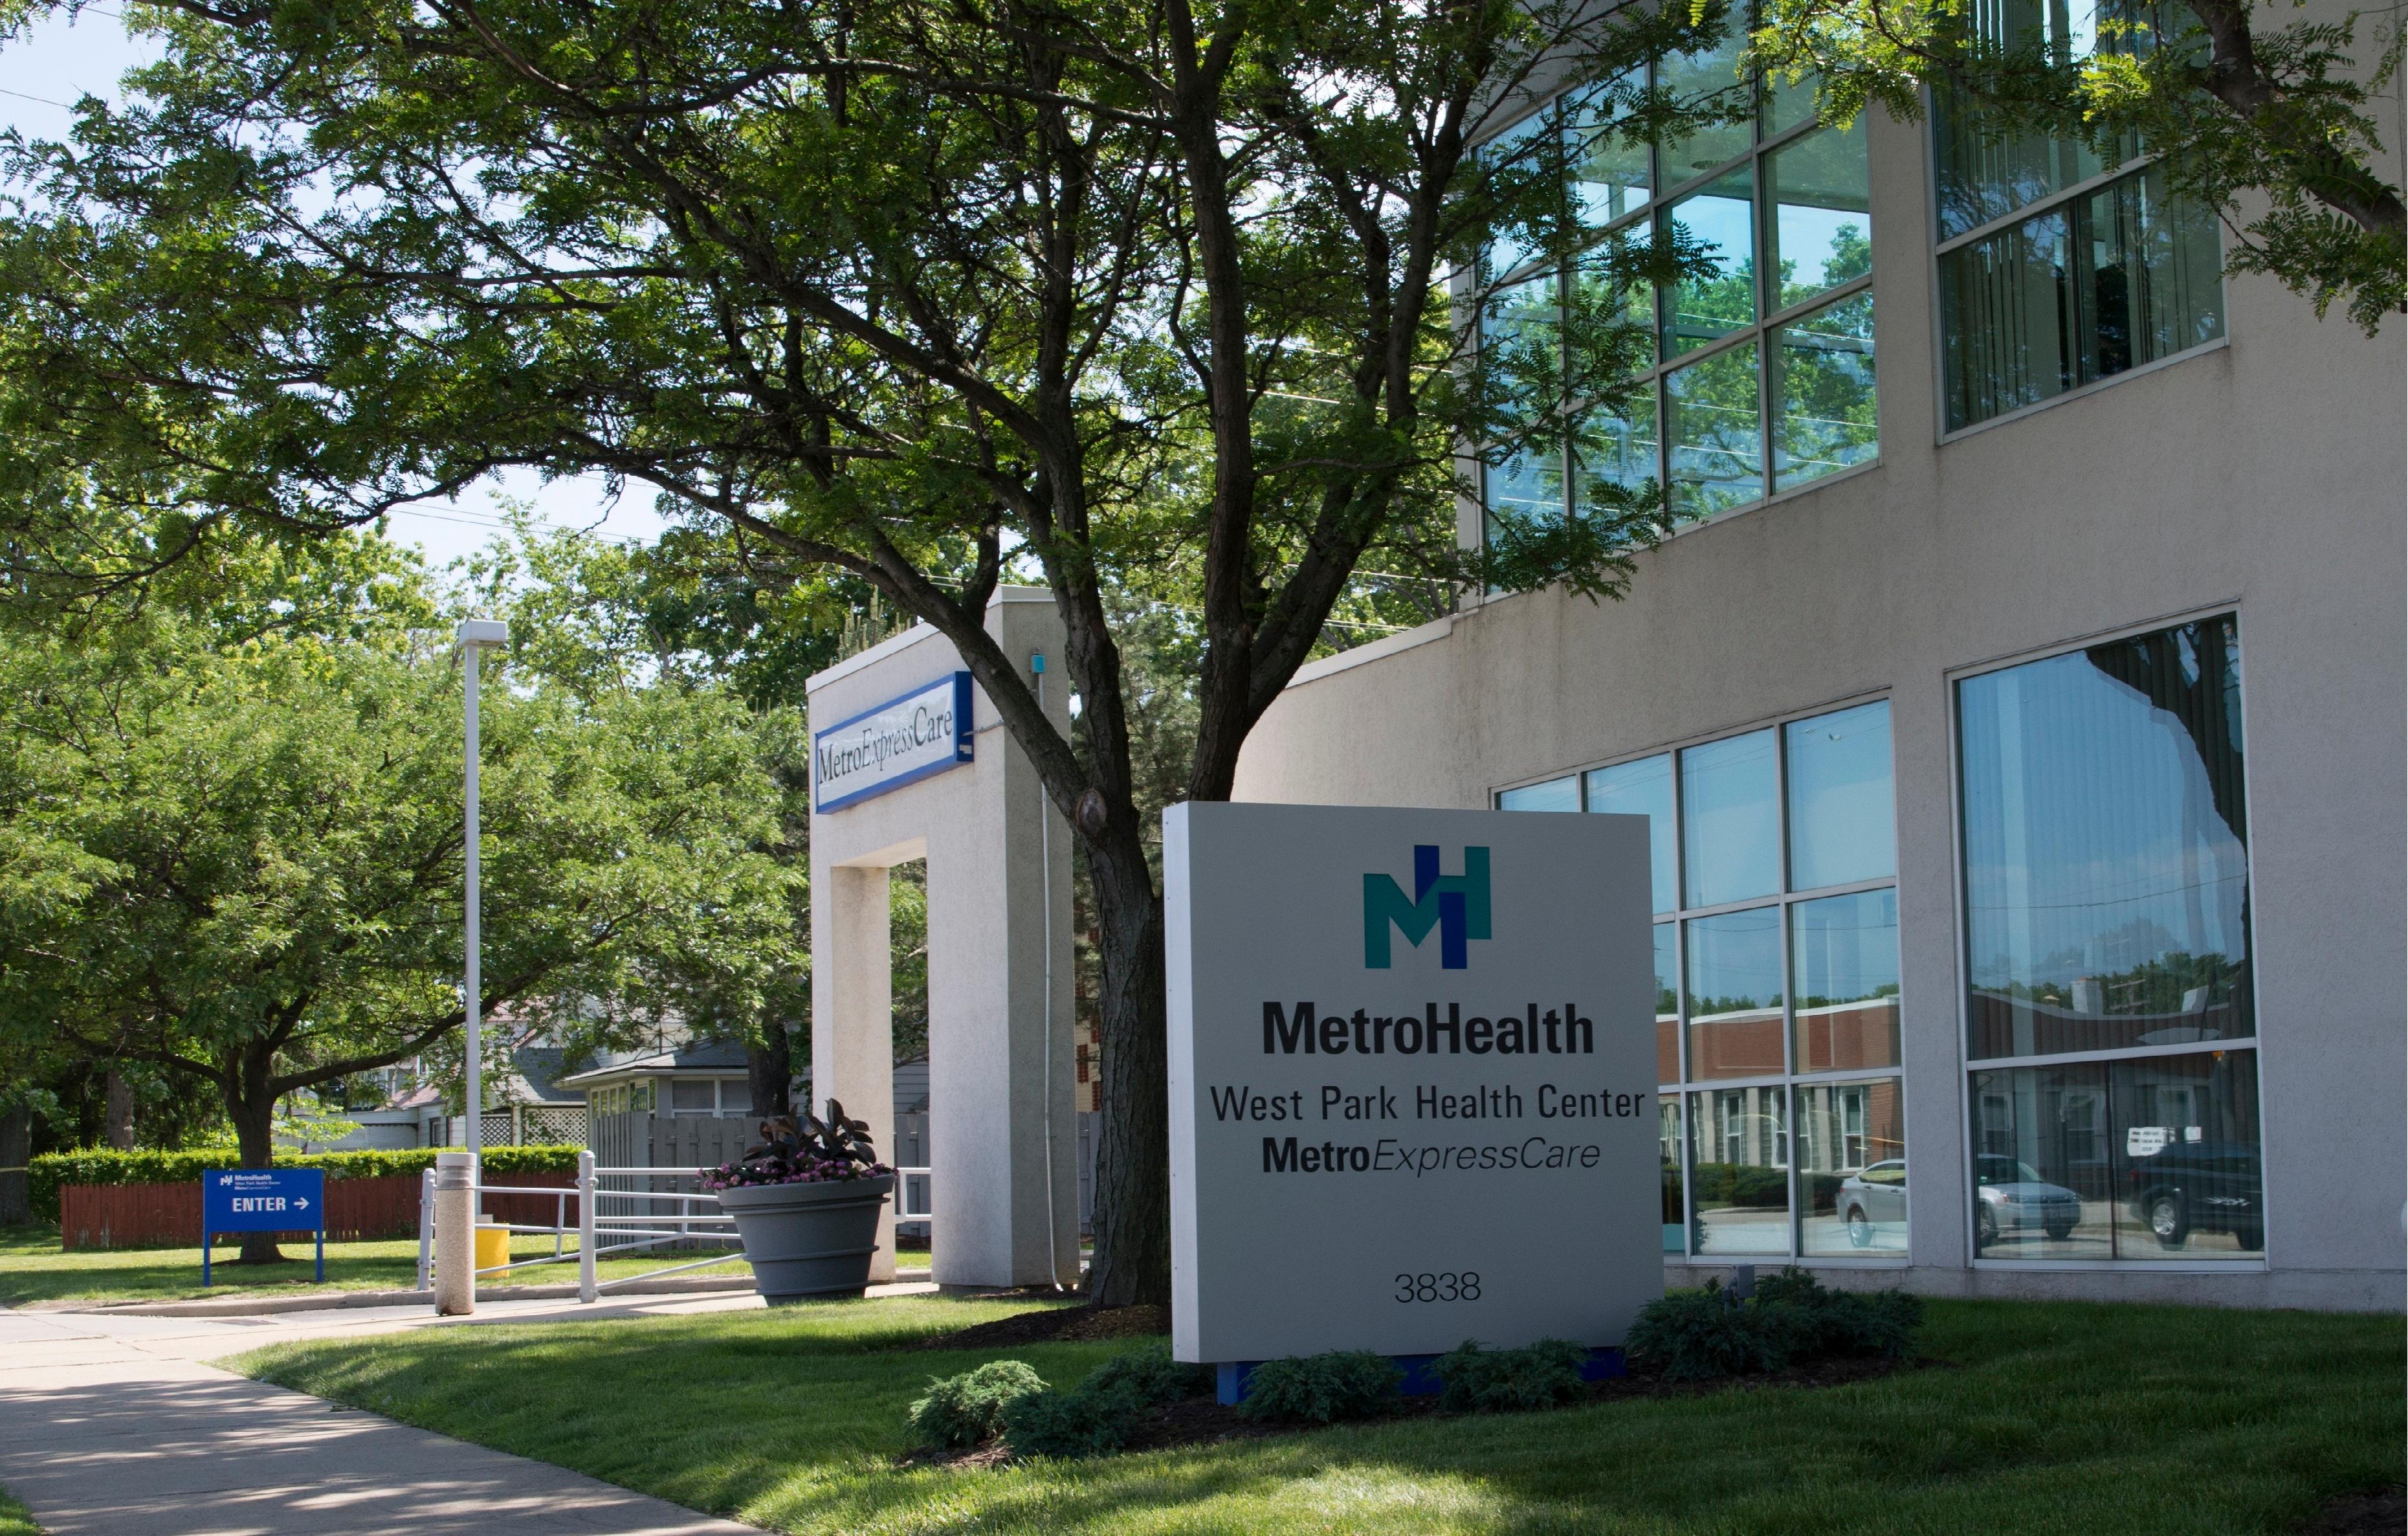 MetroHealth West Park Health Center - MetroExpressCare